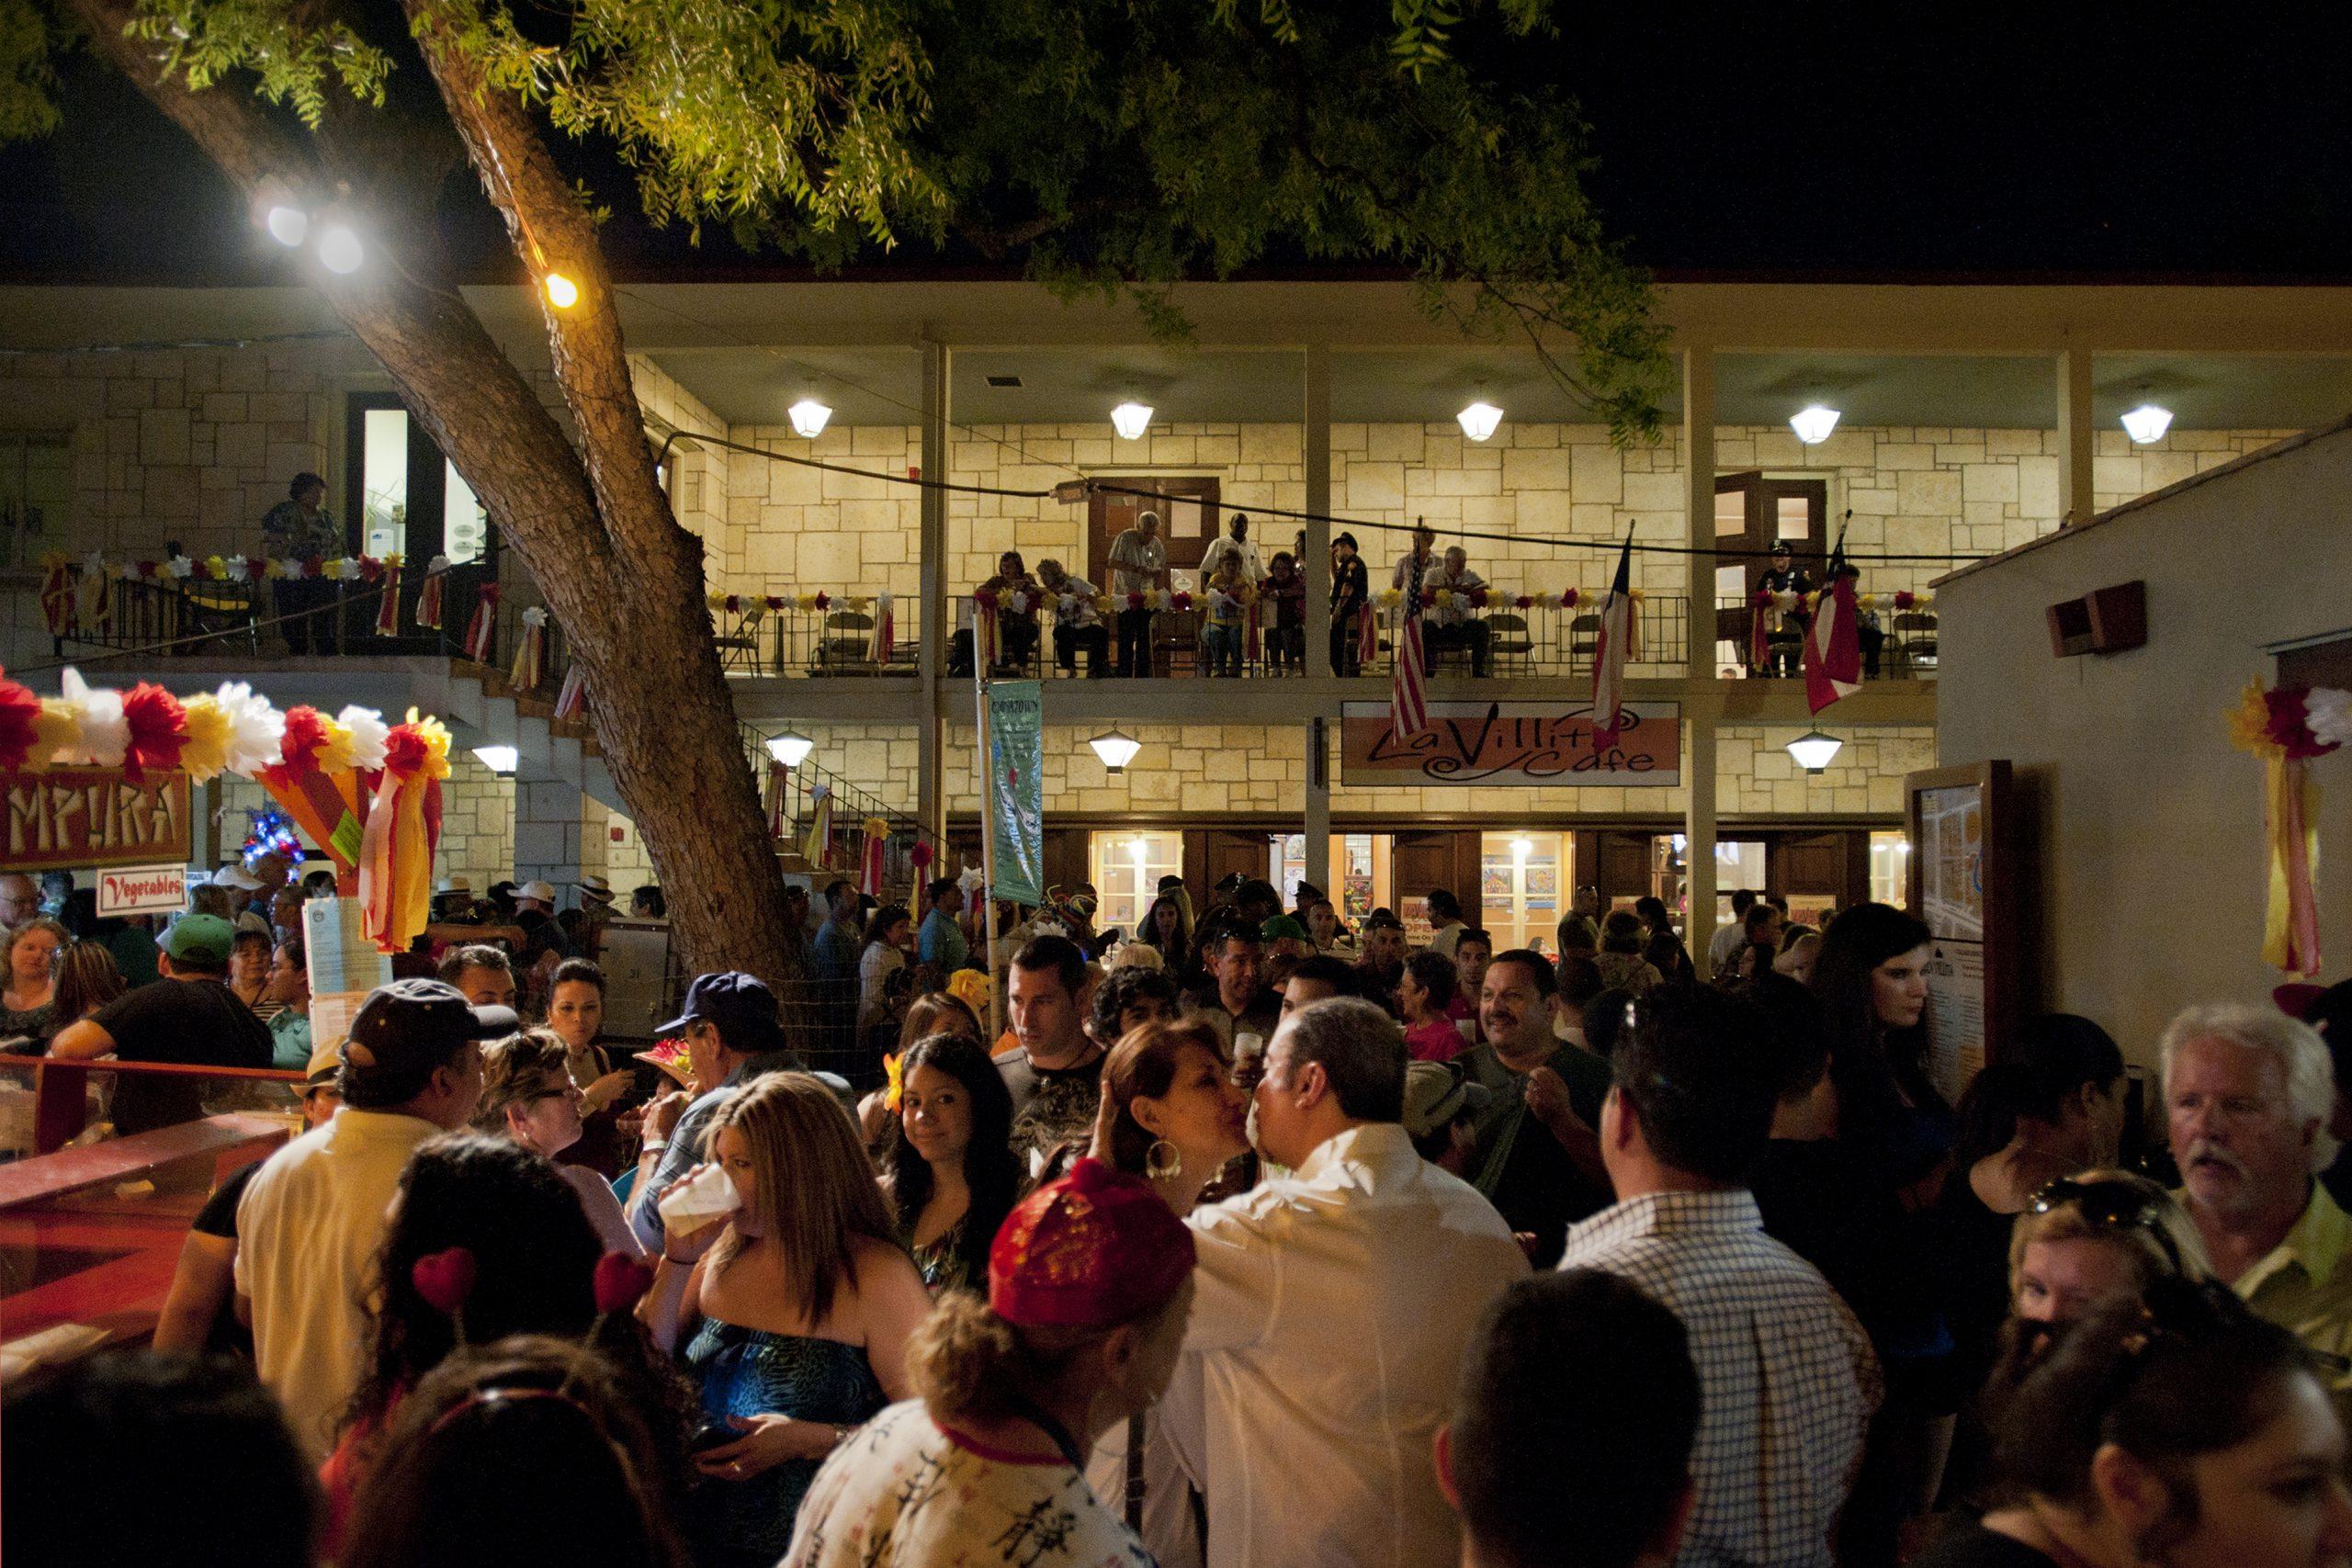 A courtyard in La Villita during NIOSA – a bit crowded. Photo by Corey Leamon.